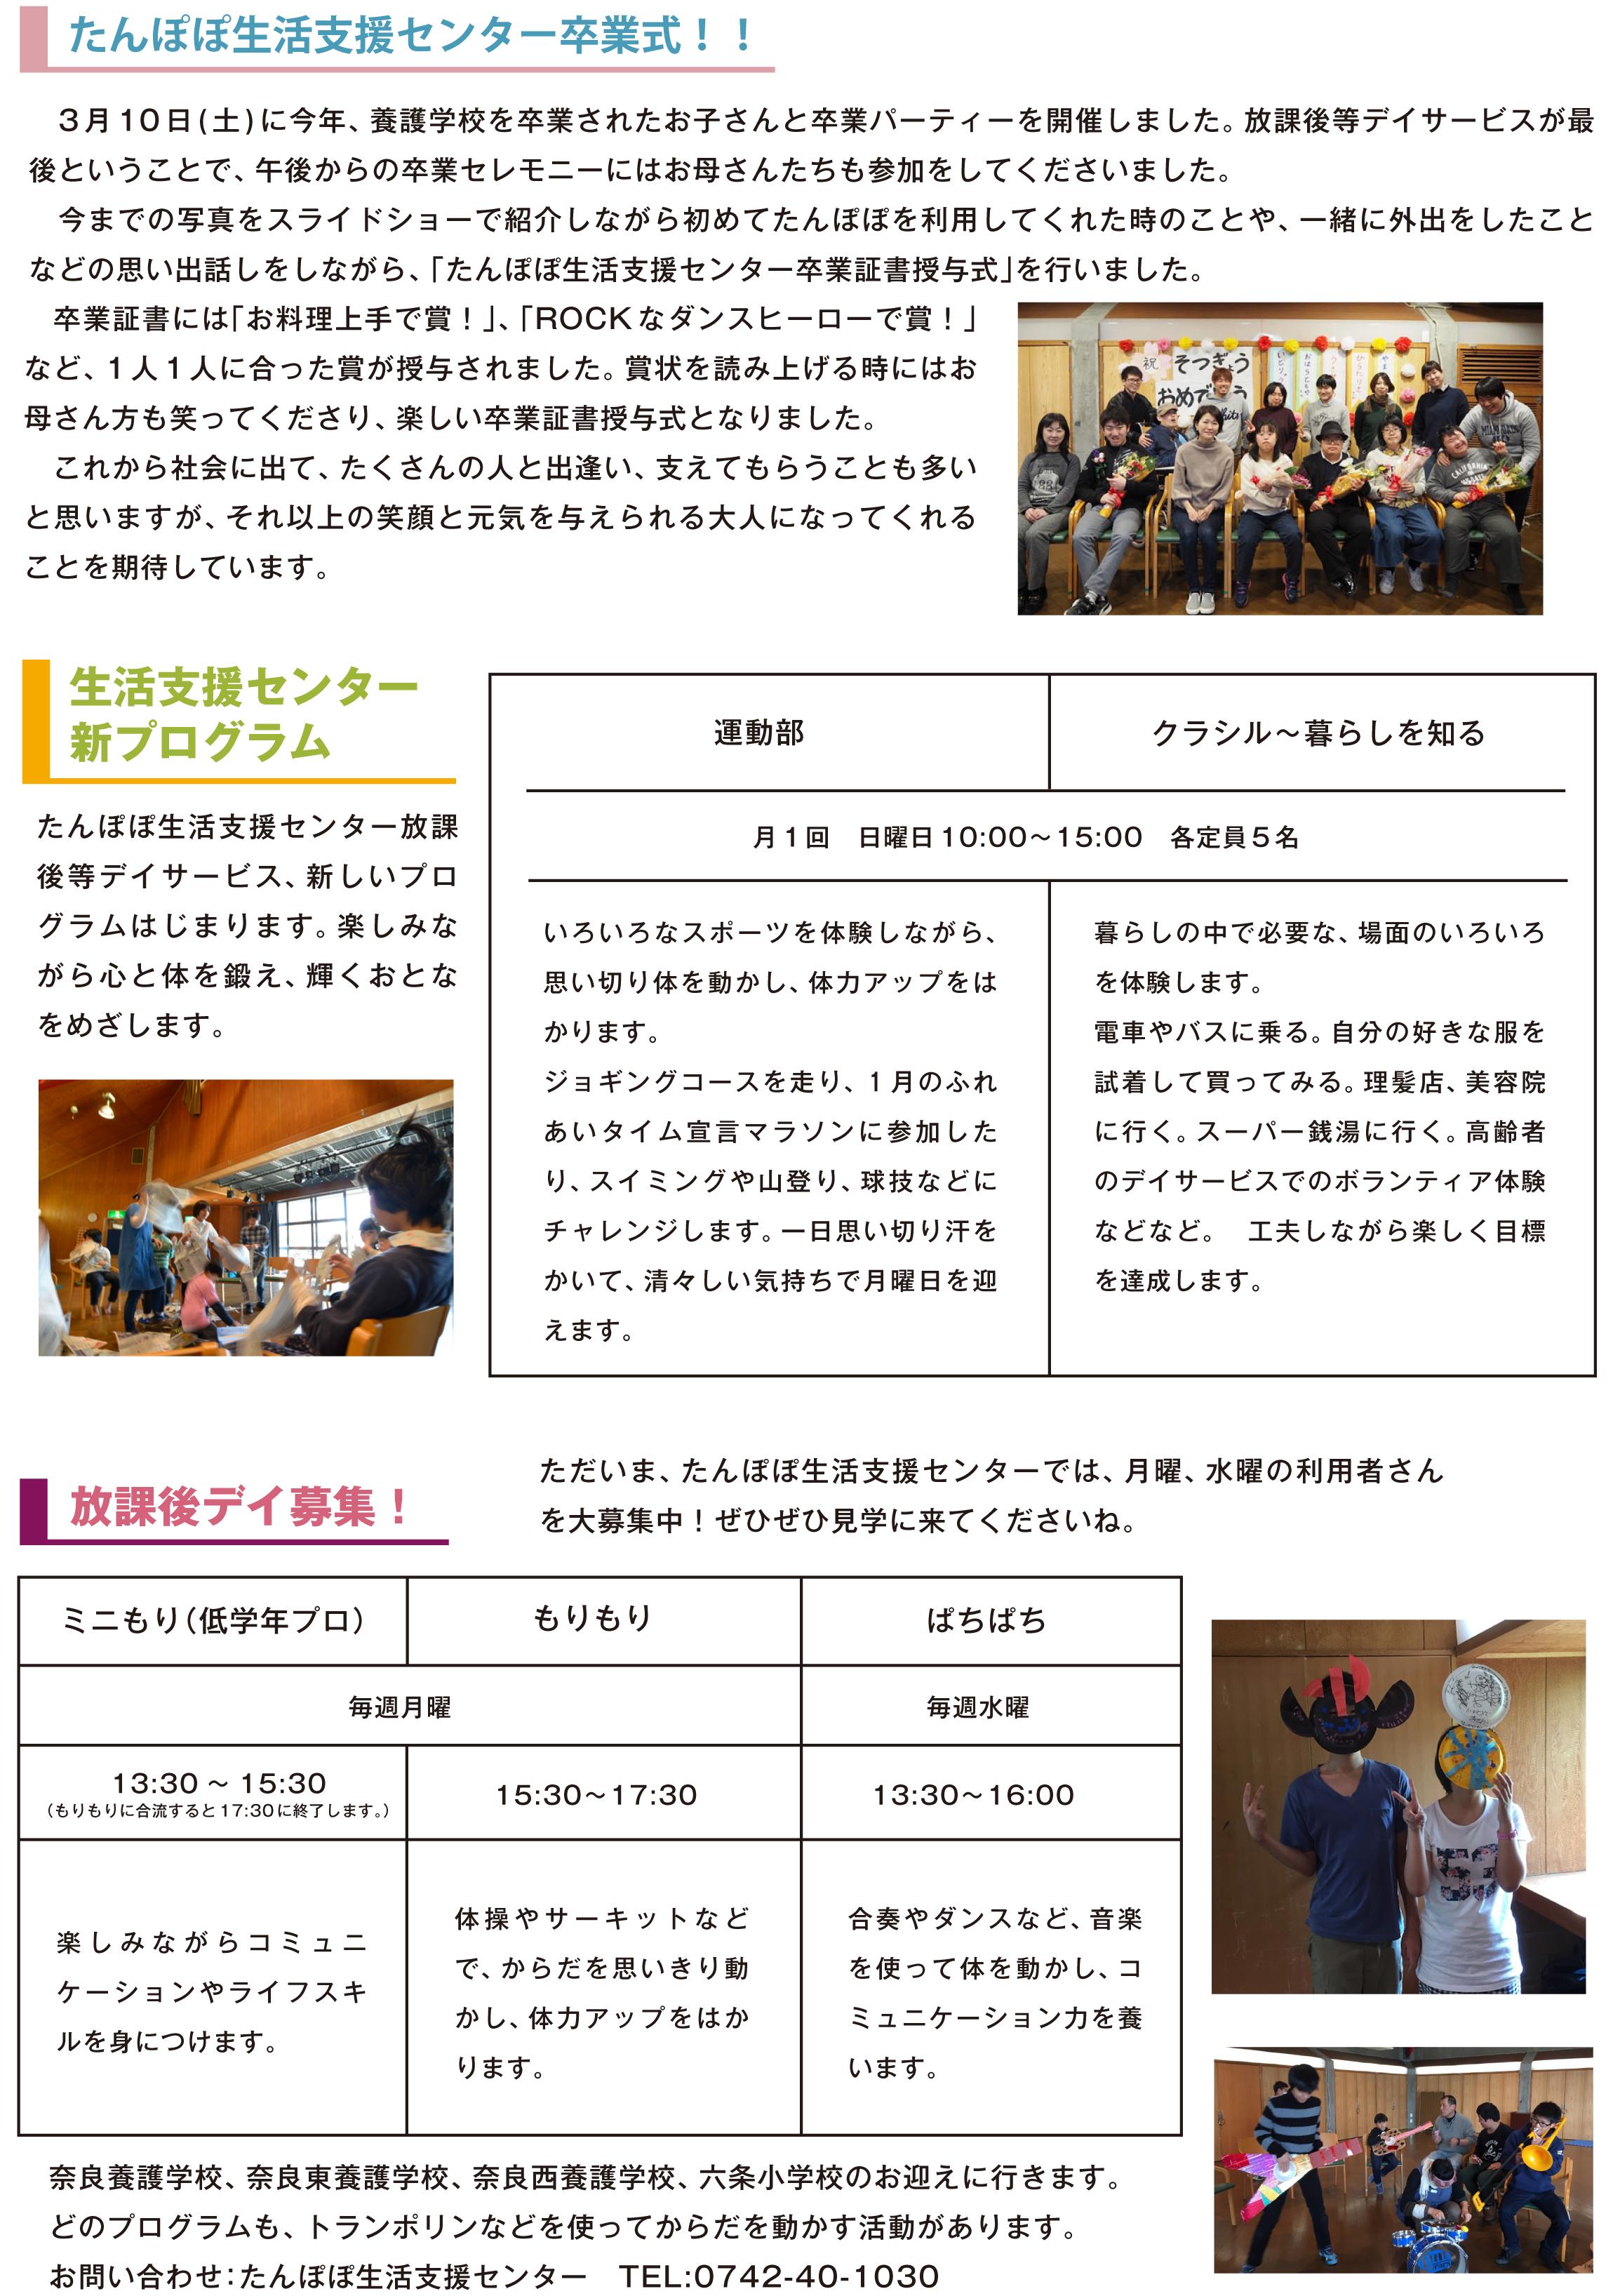 tan_tsu2018_0405A4表3ai